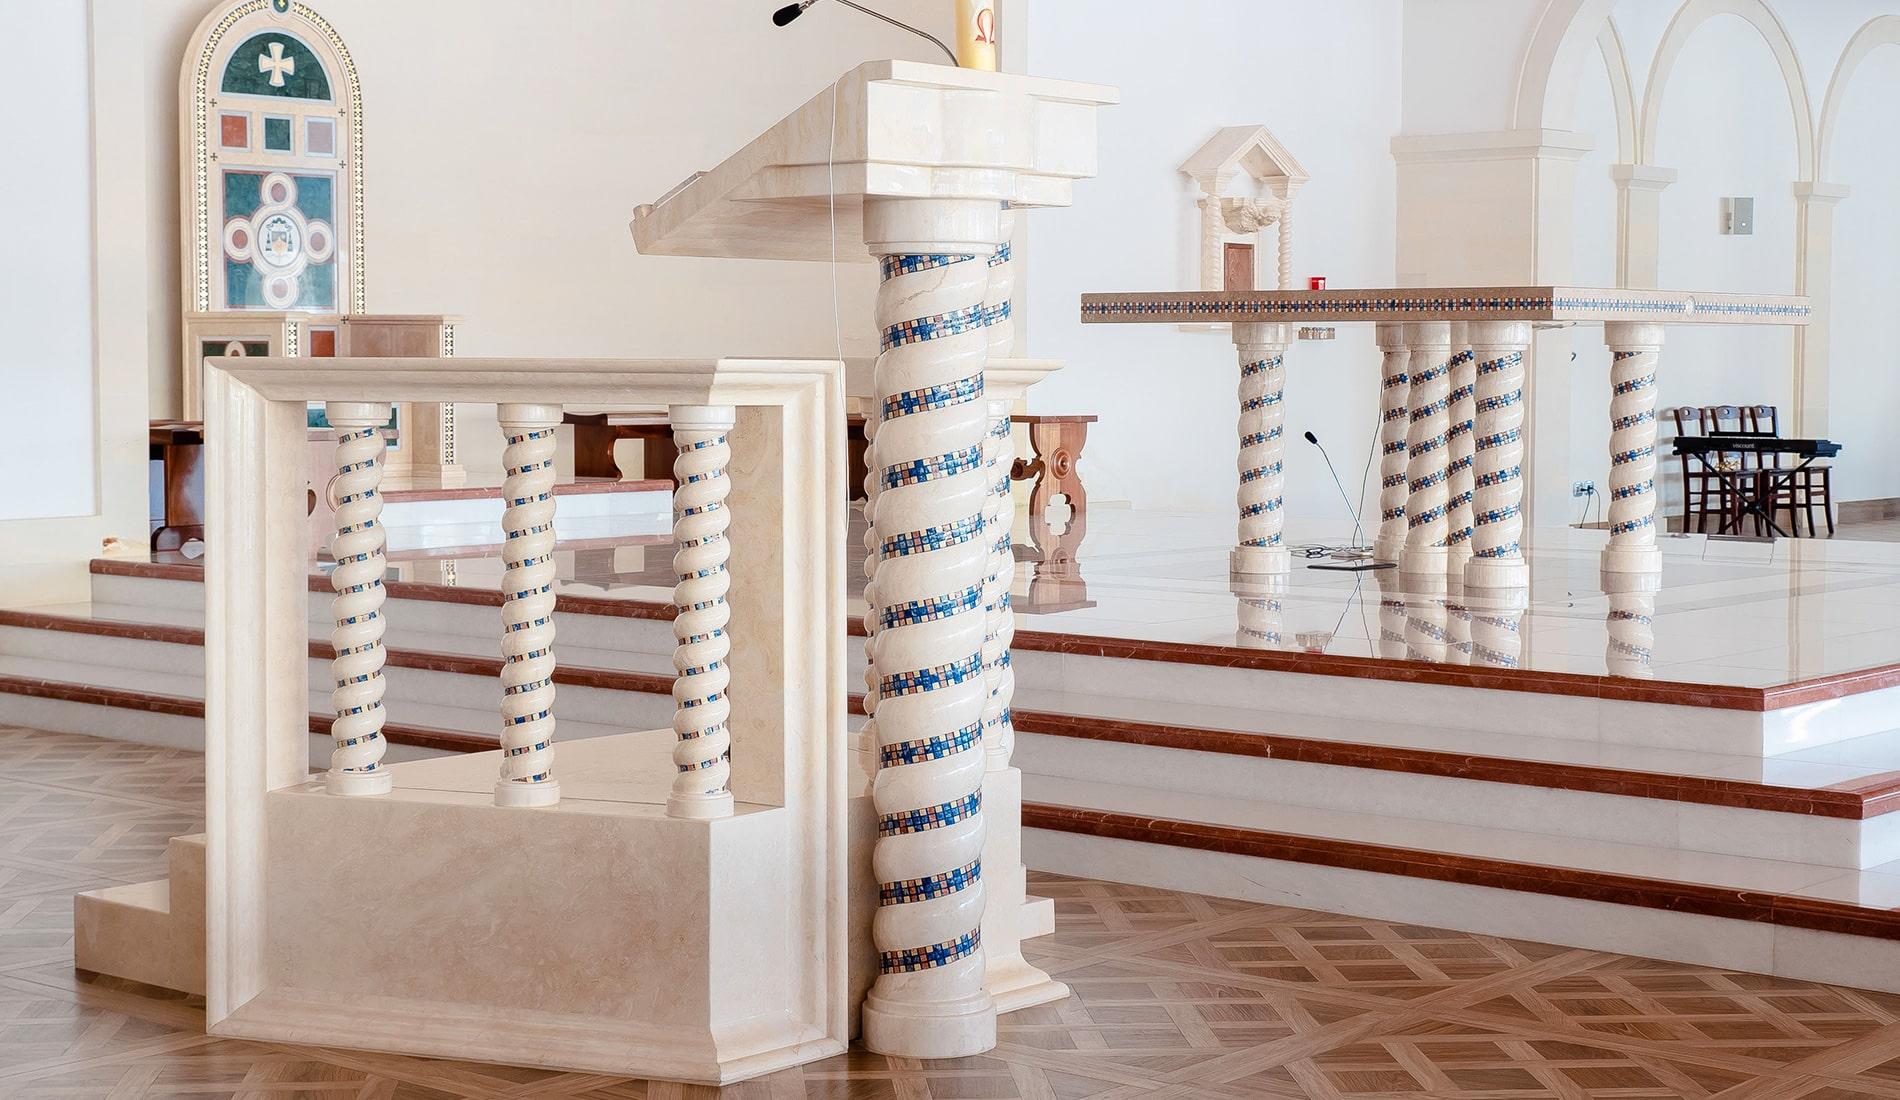 marmi strada villa castelli brindisi marmi graniti mosaici arte sacra architettura chiese